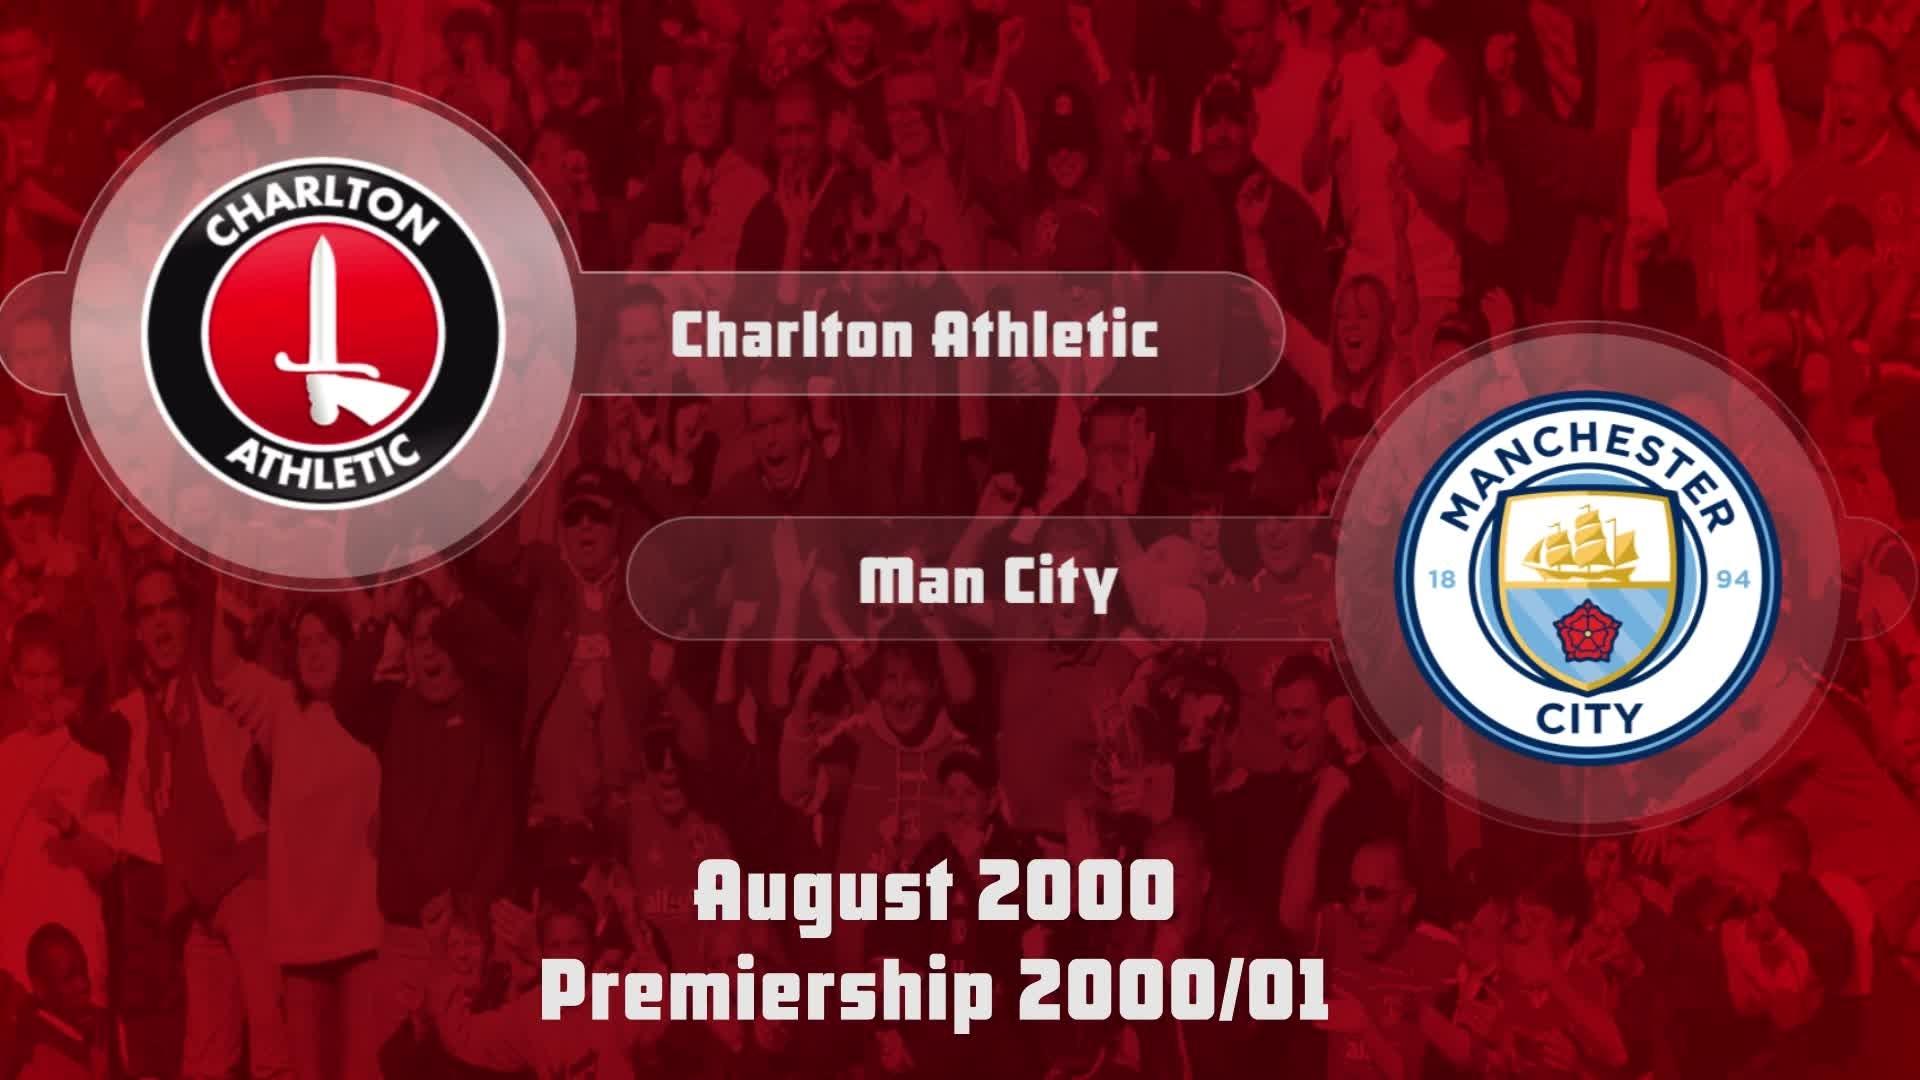 01 HIGHLIGHTS | Charlton 4 Man City 0 (Aug 2000)